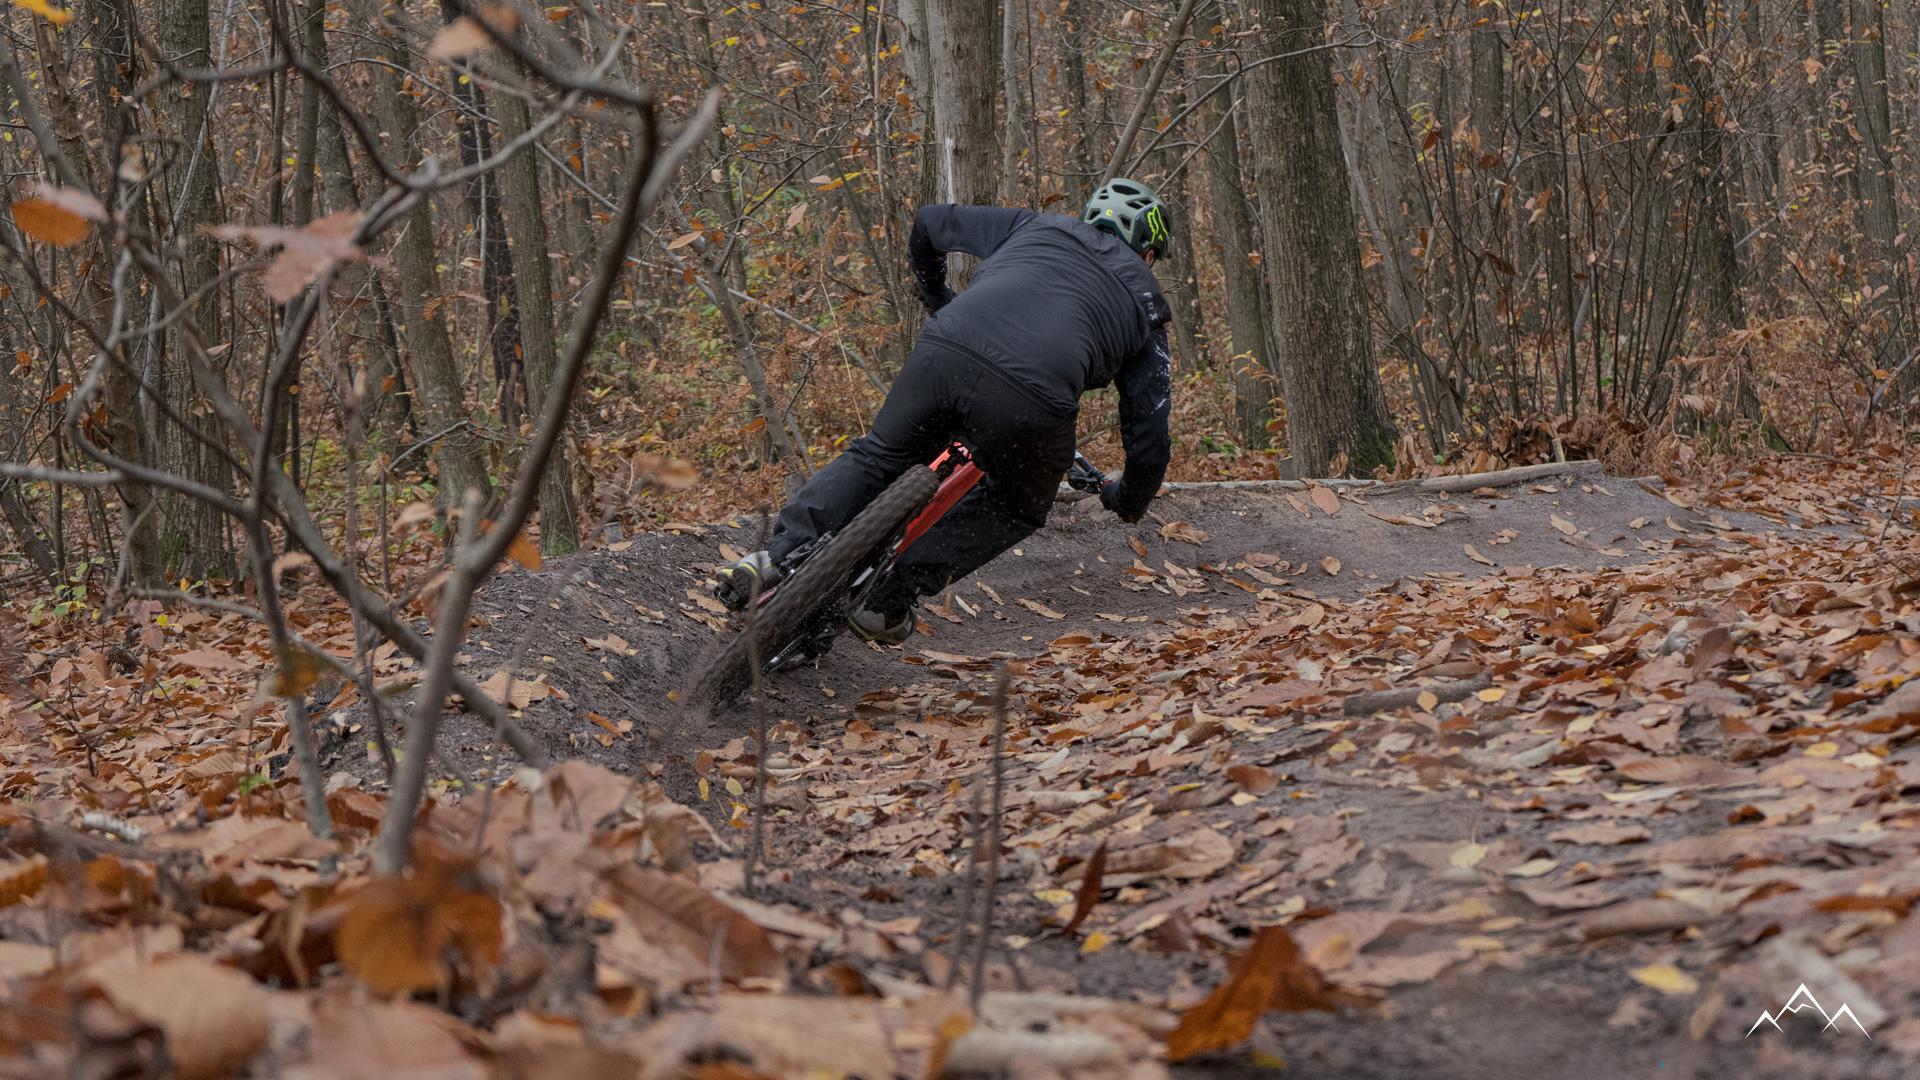 Pirelli Scorpion eMtb riding